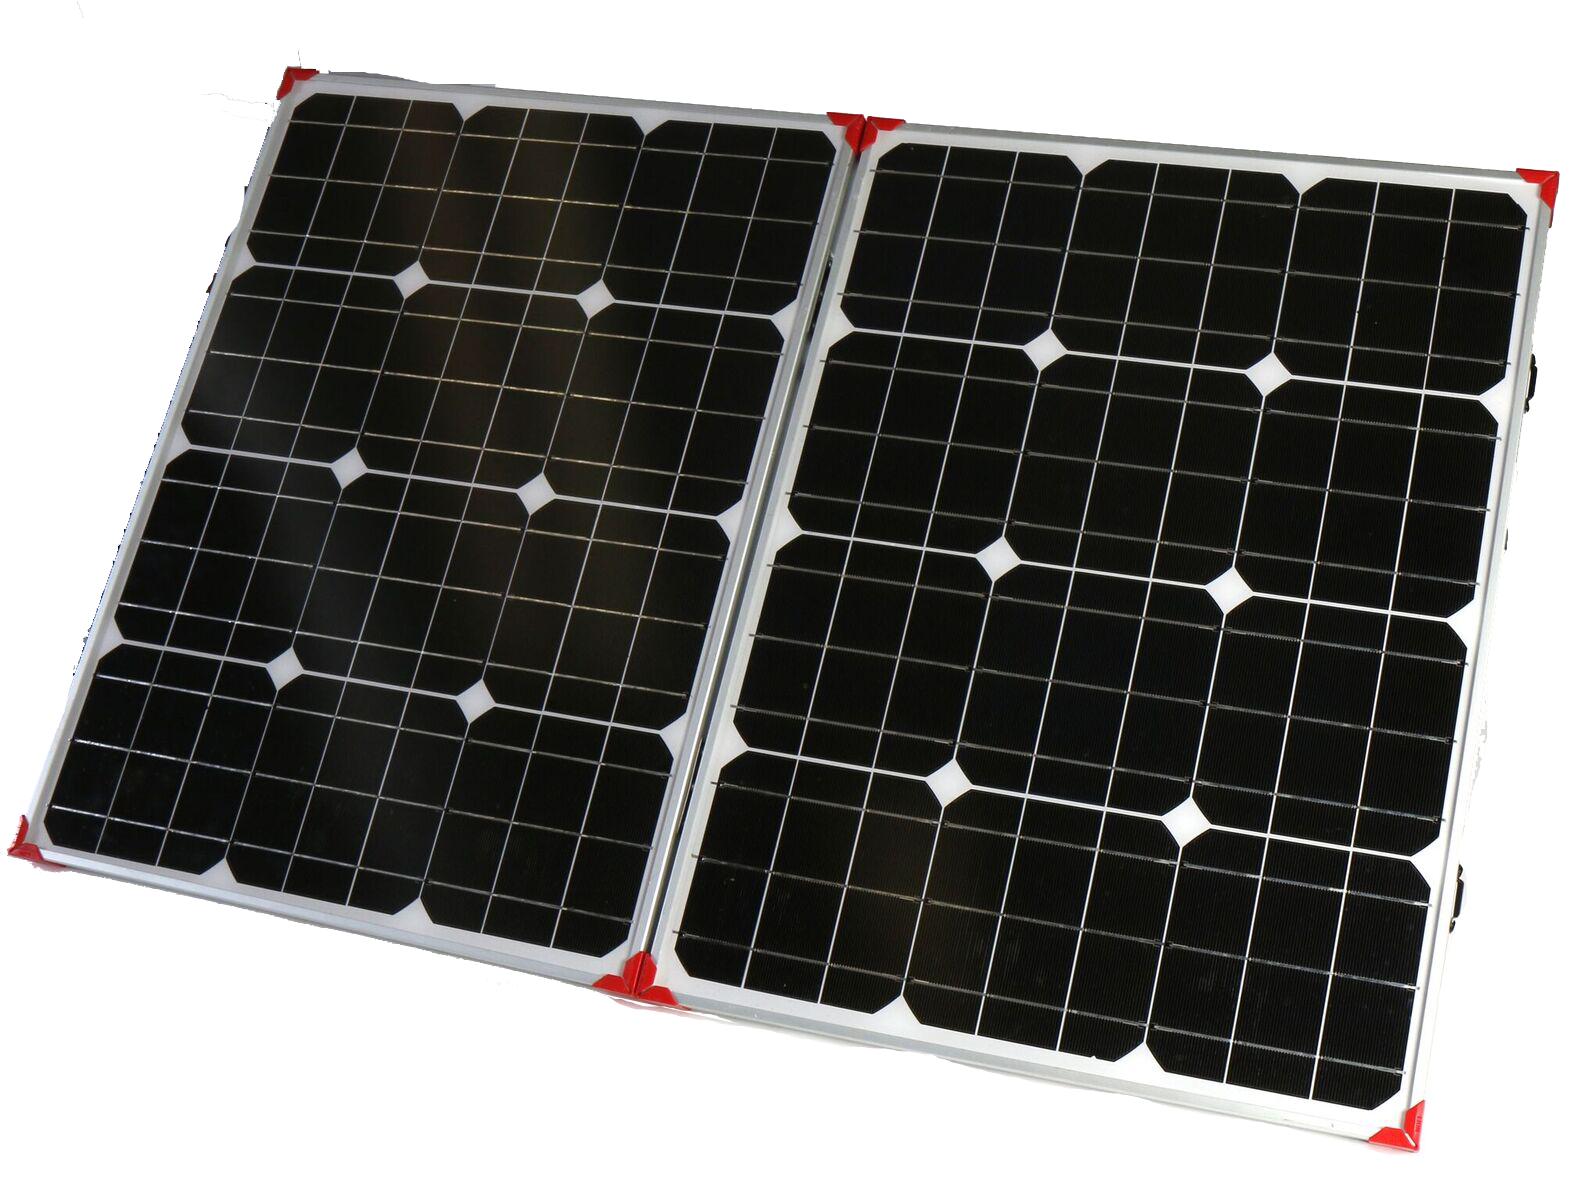 hn-solar-panel-clean.png